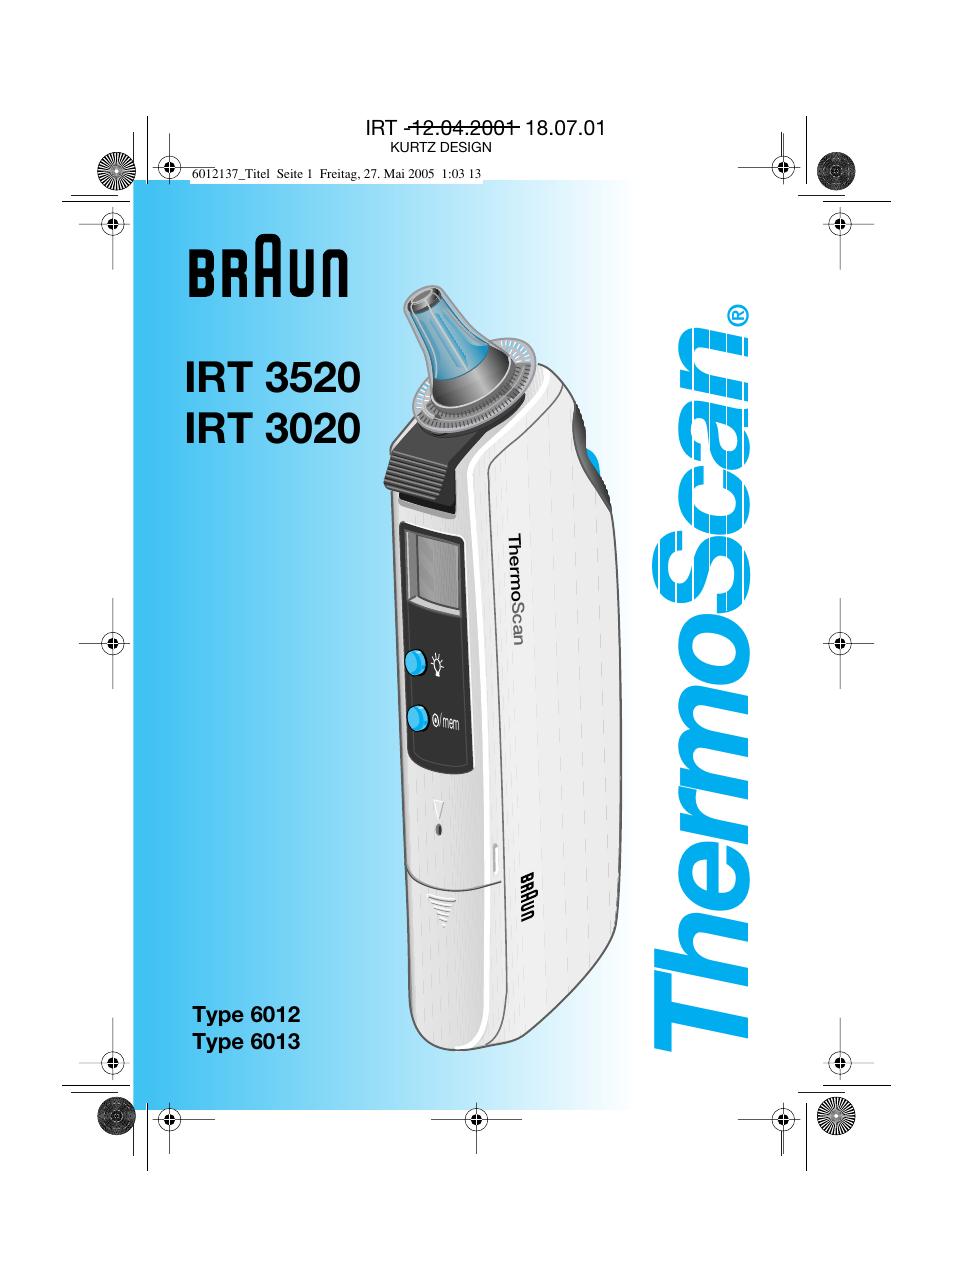 Braun Thermoscan Irt 3020 Instructions